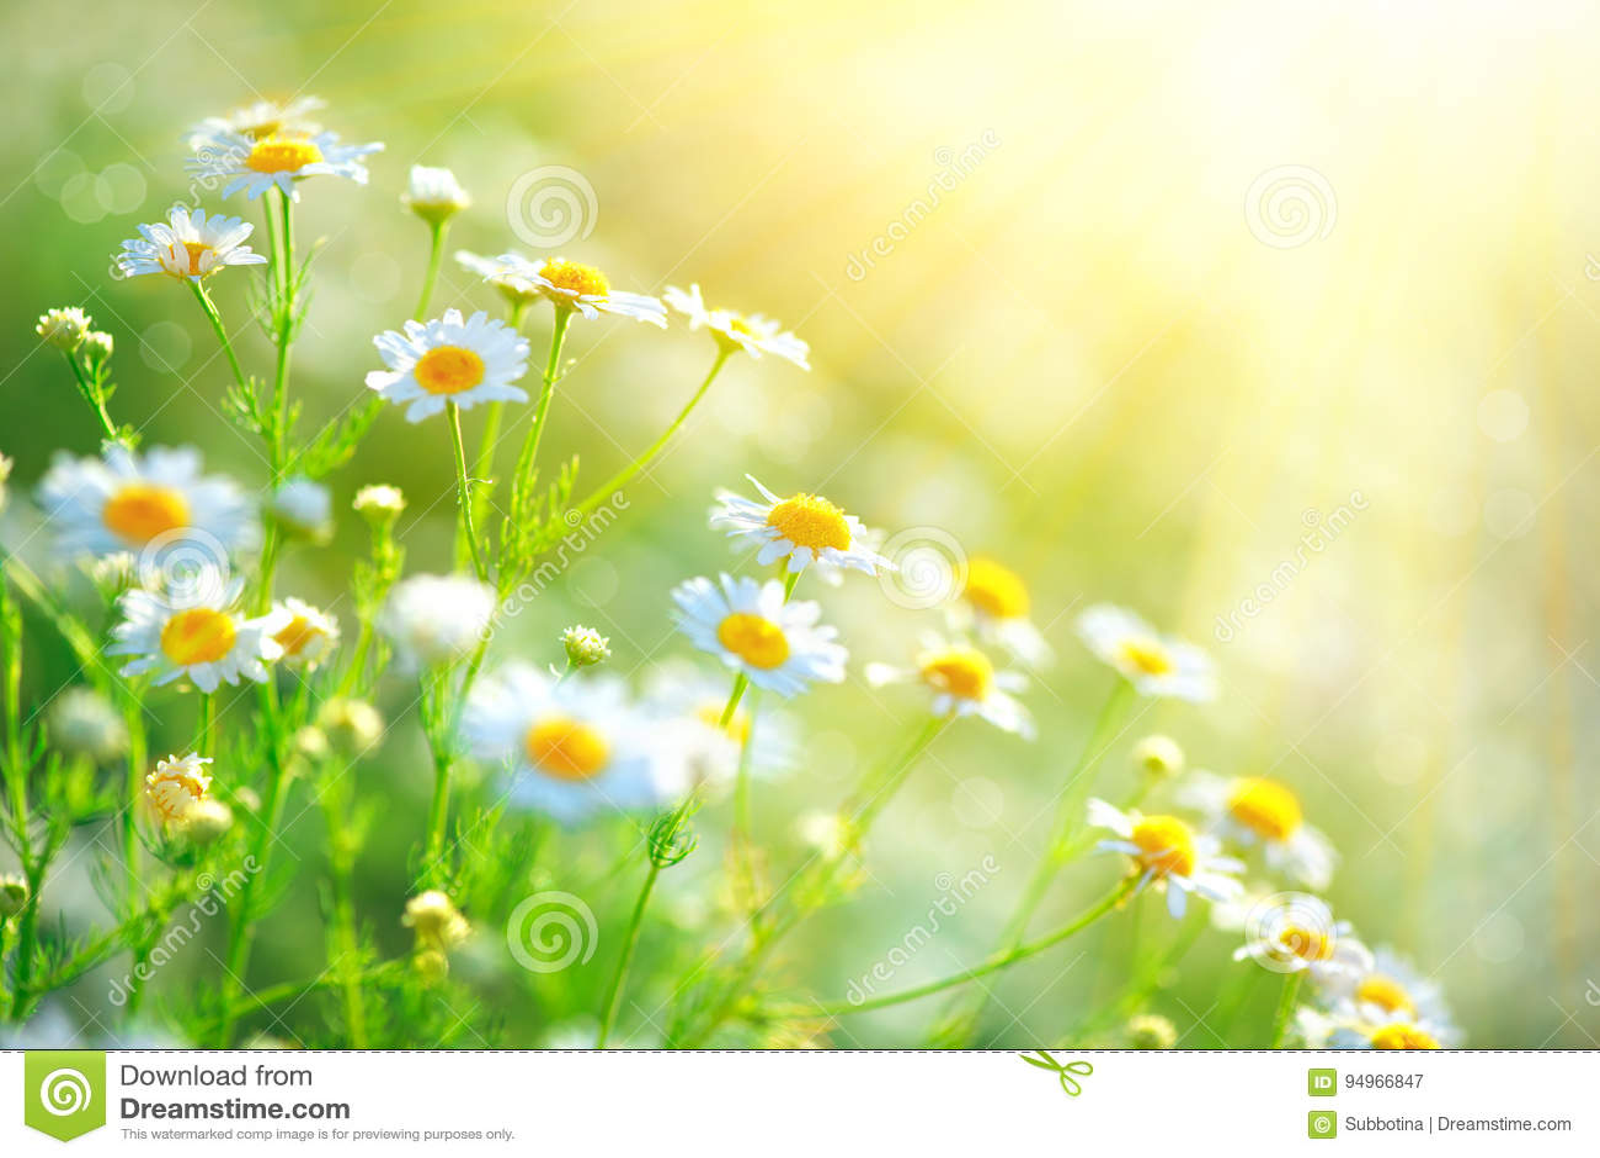 Chamomile field flowers border. Beautiful nature scene